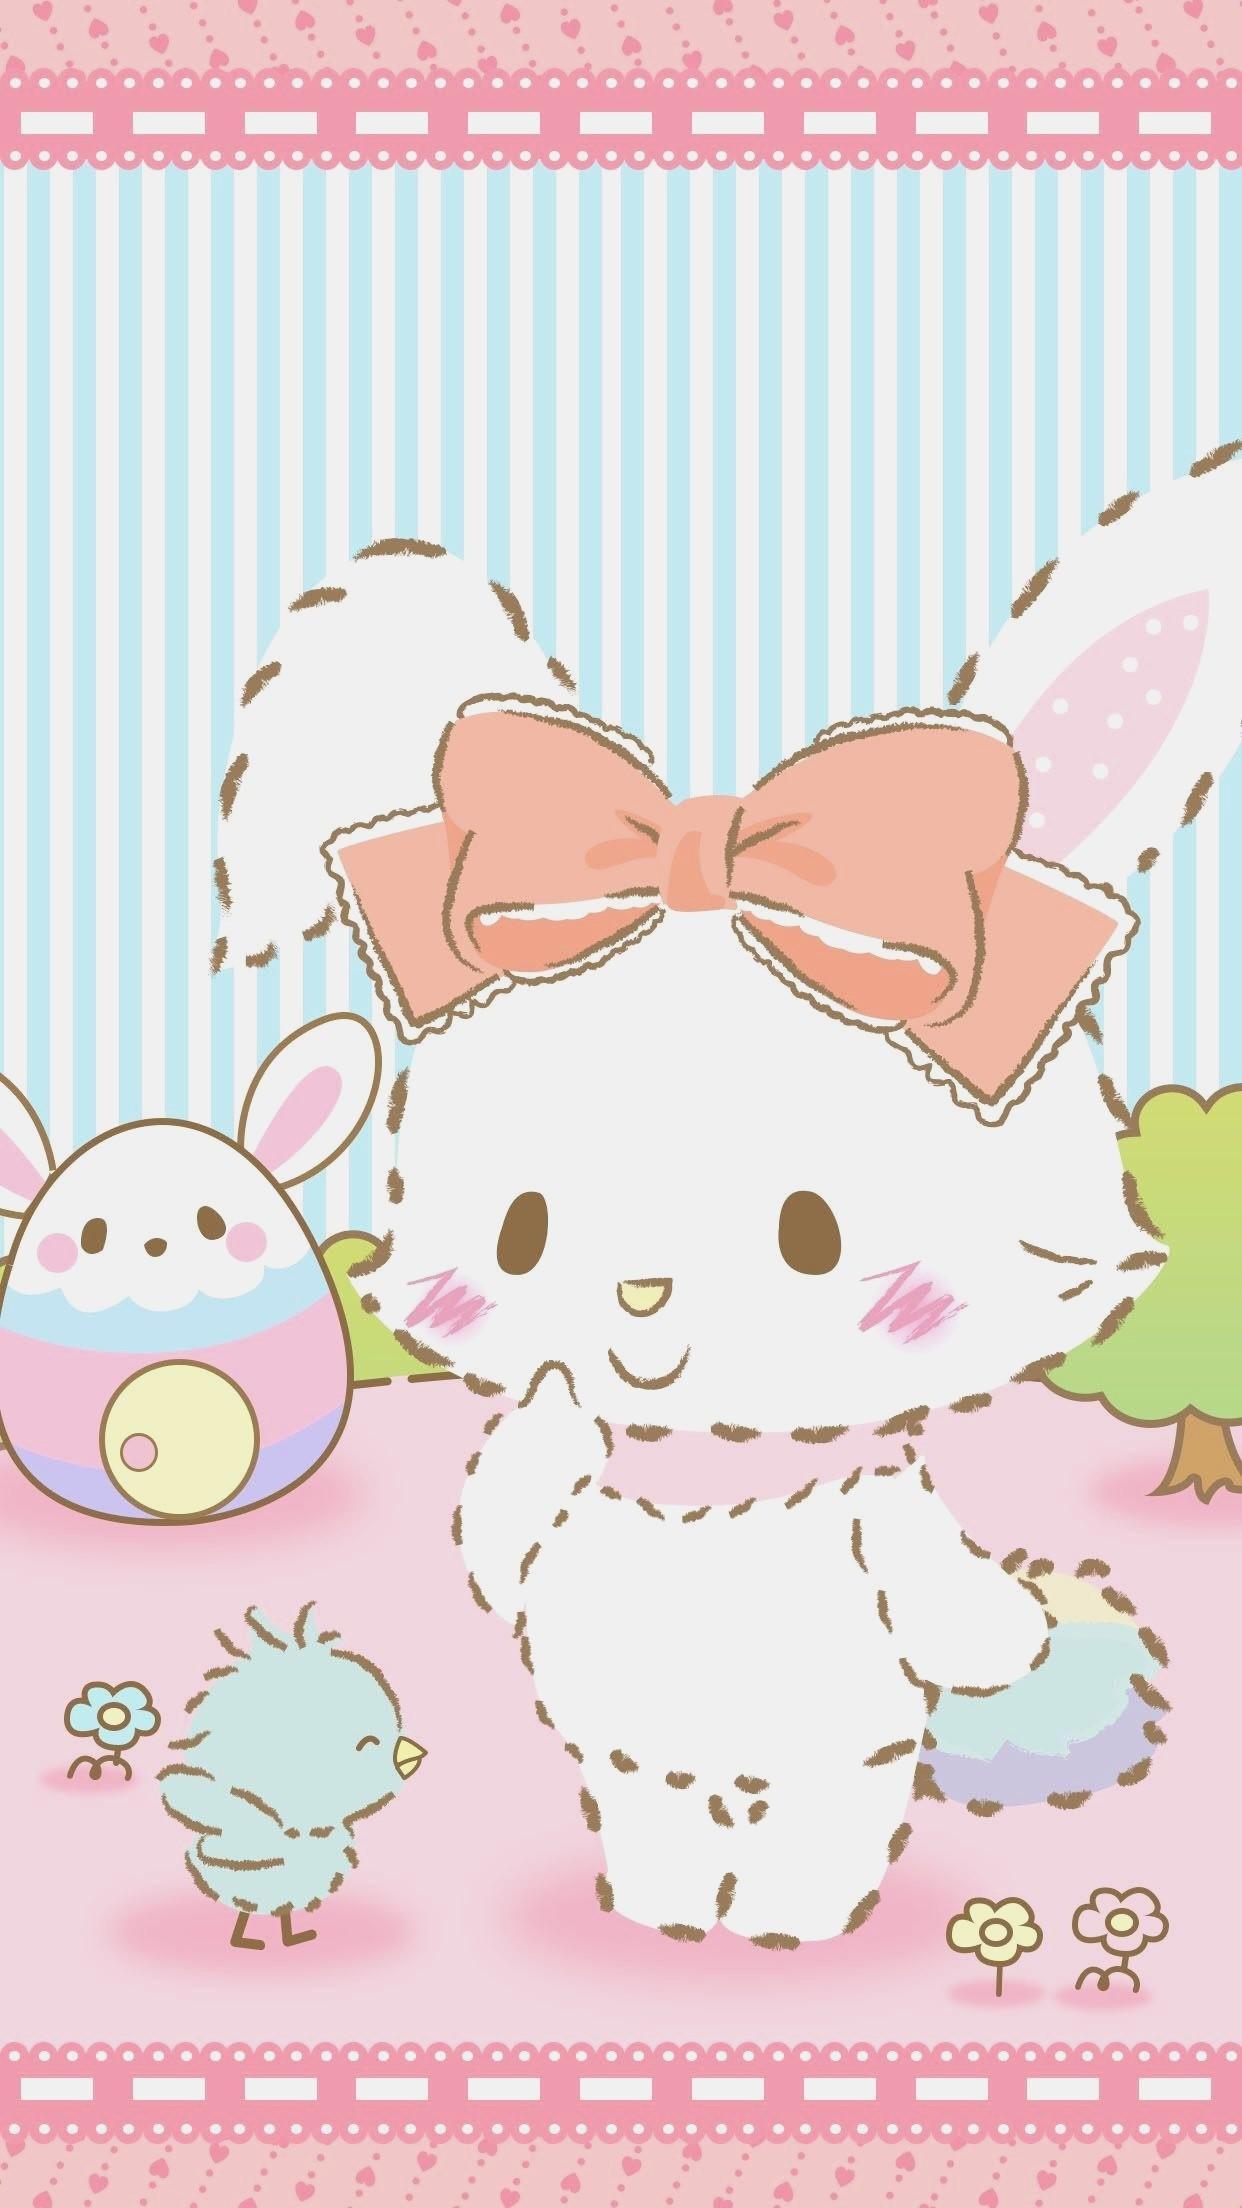 Res: 1242x2208, Easter Wallpaper Sanrio Wallpaper I Wallpaper Easter Sanrio Characters  Iphone